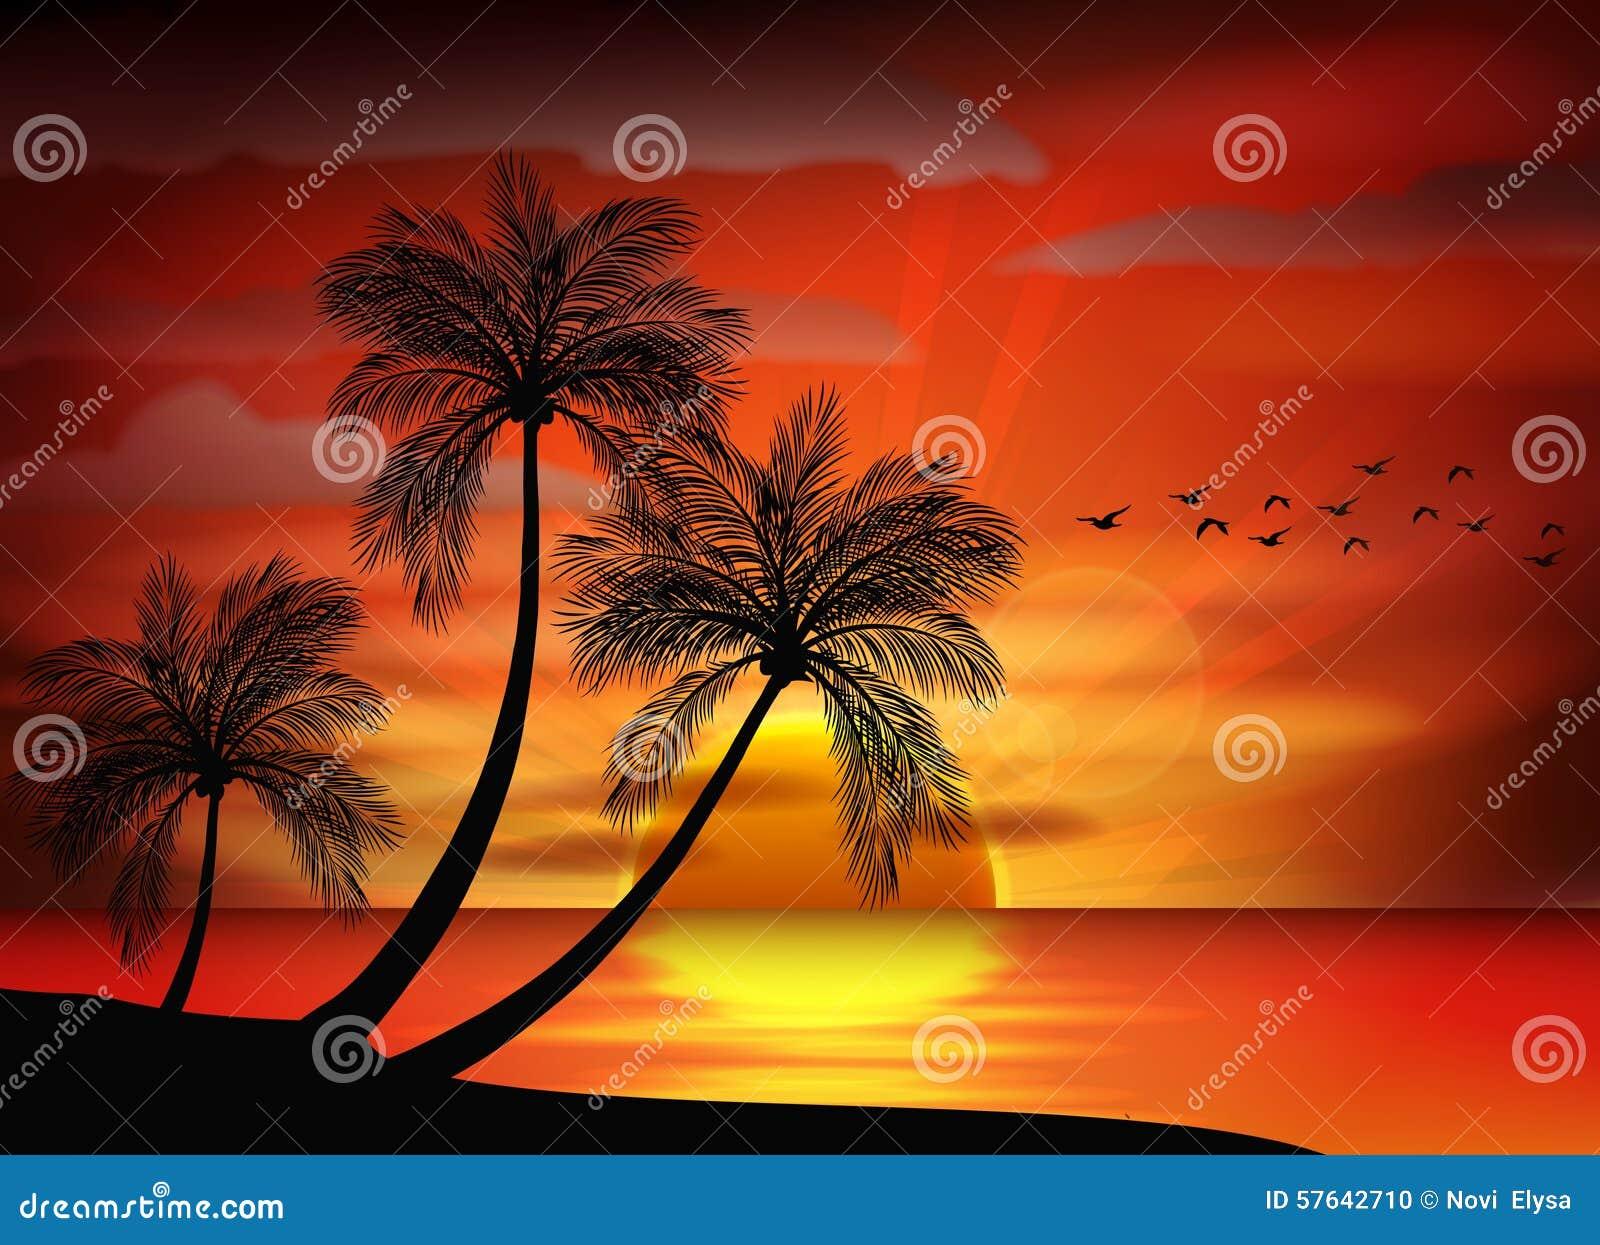 Photo of sunset on sea stock vector image 57642710 for Sfondi desktop tramonti mare